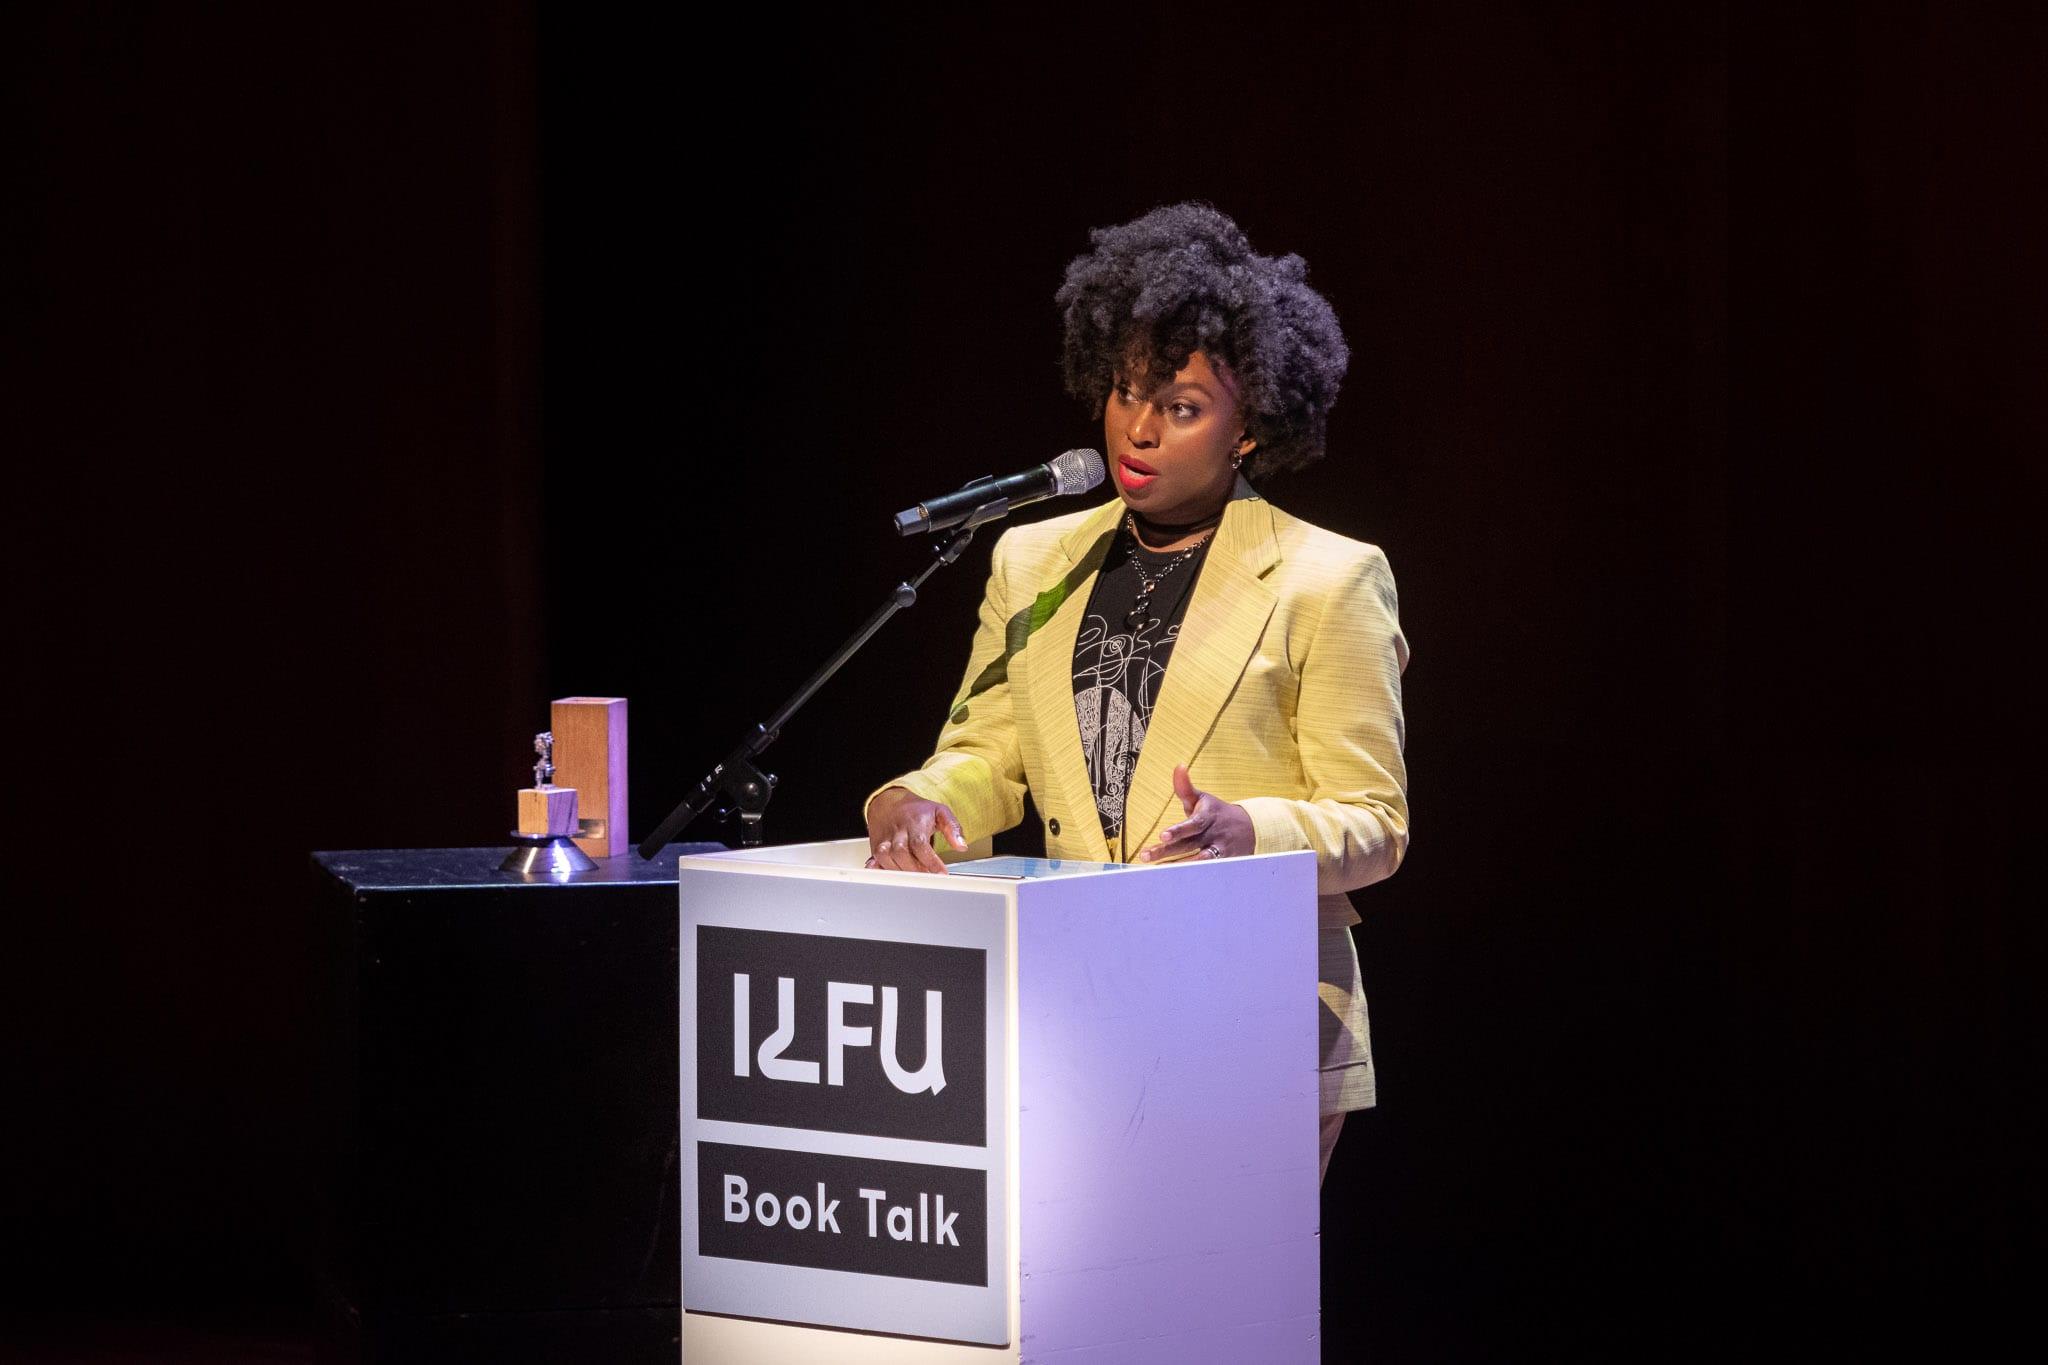 JdH-20200111 ILFU Belle van Zuylenlezing Chimamanda Adichie 104_Foto Jelmer de Haas_WEB